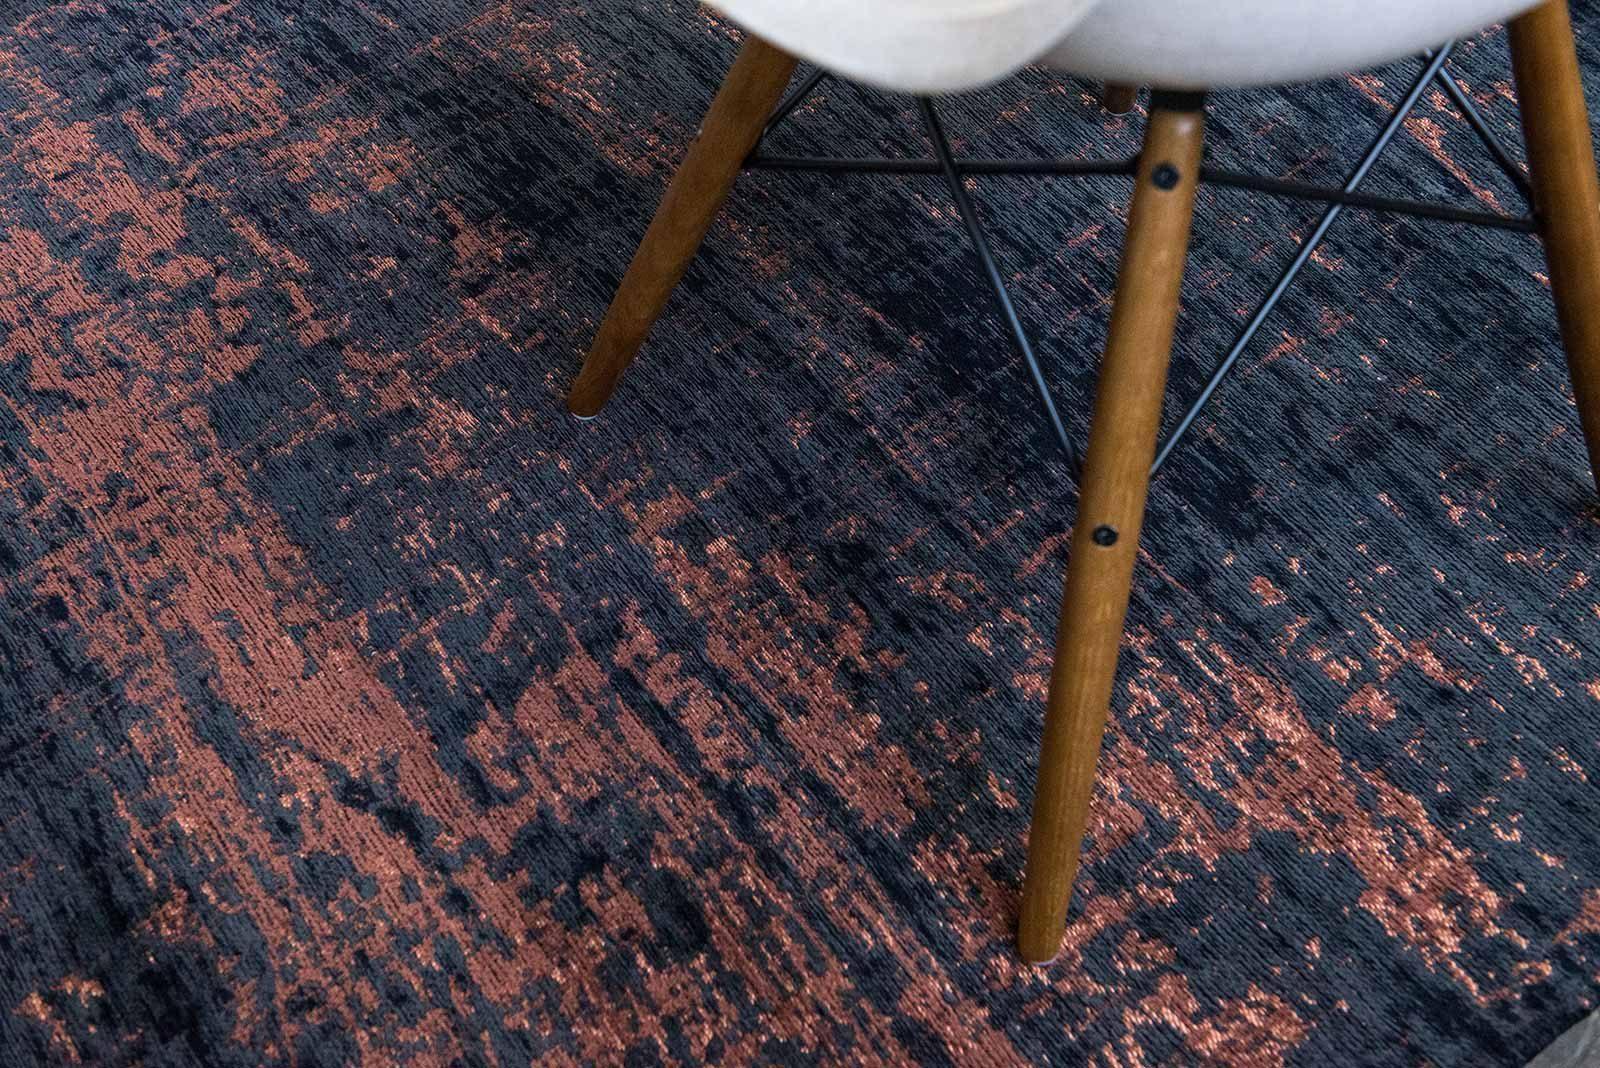 alfombras Louis De Poortere LX8925 Mad Men Griff Soho Copper zoom 2